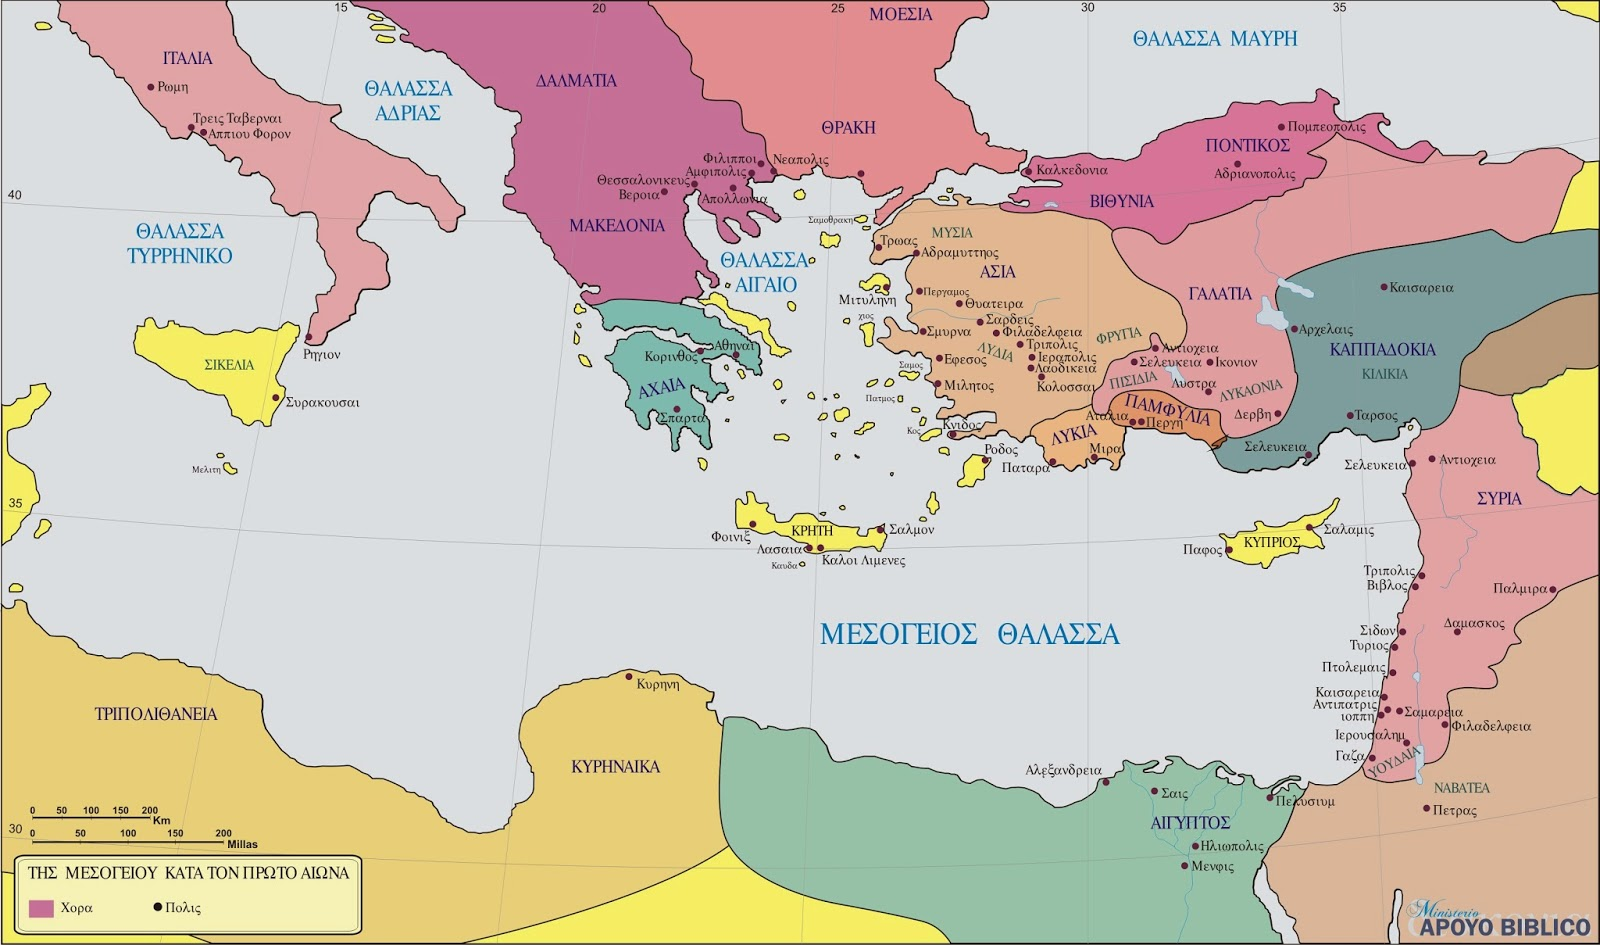 mapa mediterraneo Ministerio APOYO BÍBLICO: MAPA DEL MEDITERRÁNEO SIGLO I mapa mediterraneo